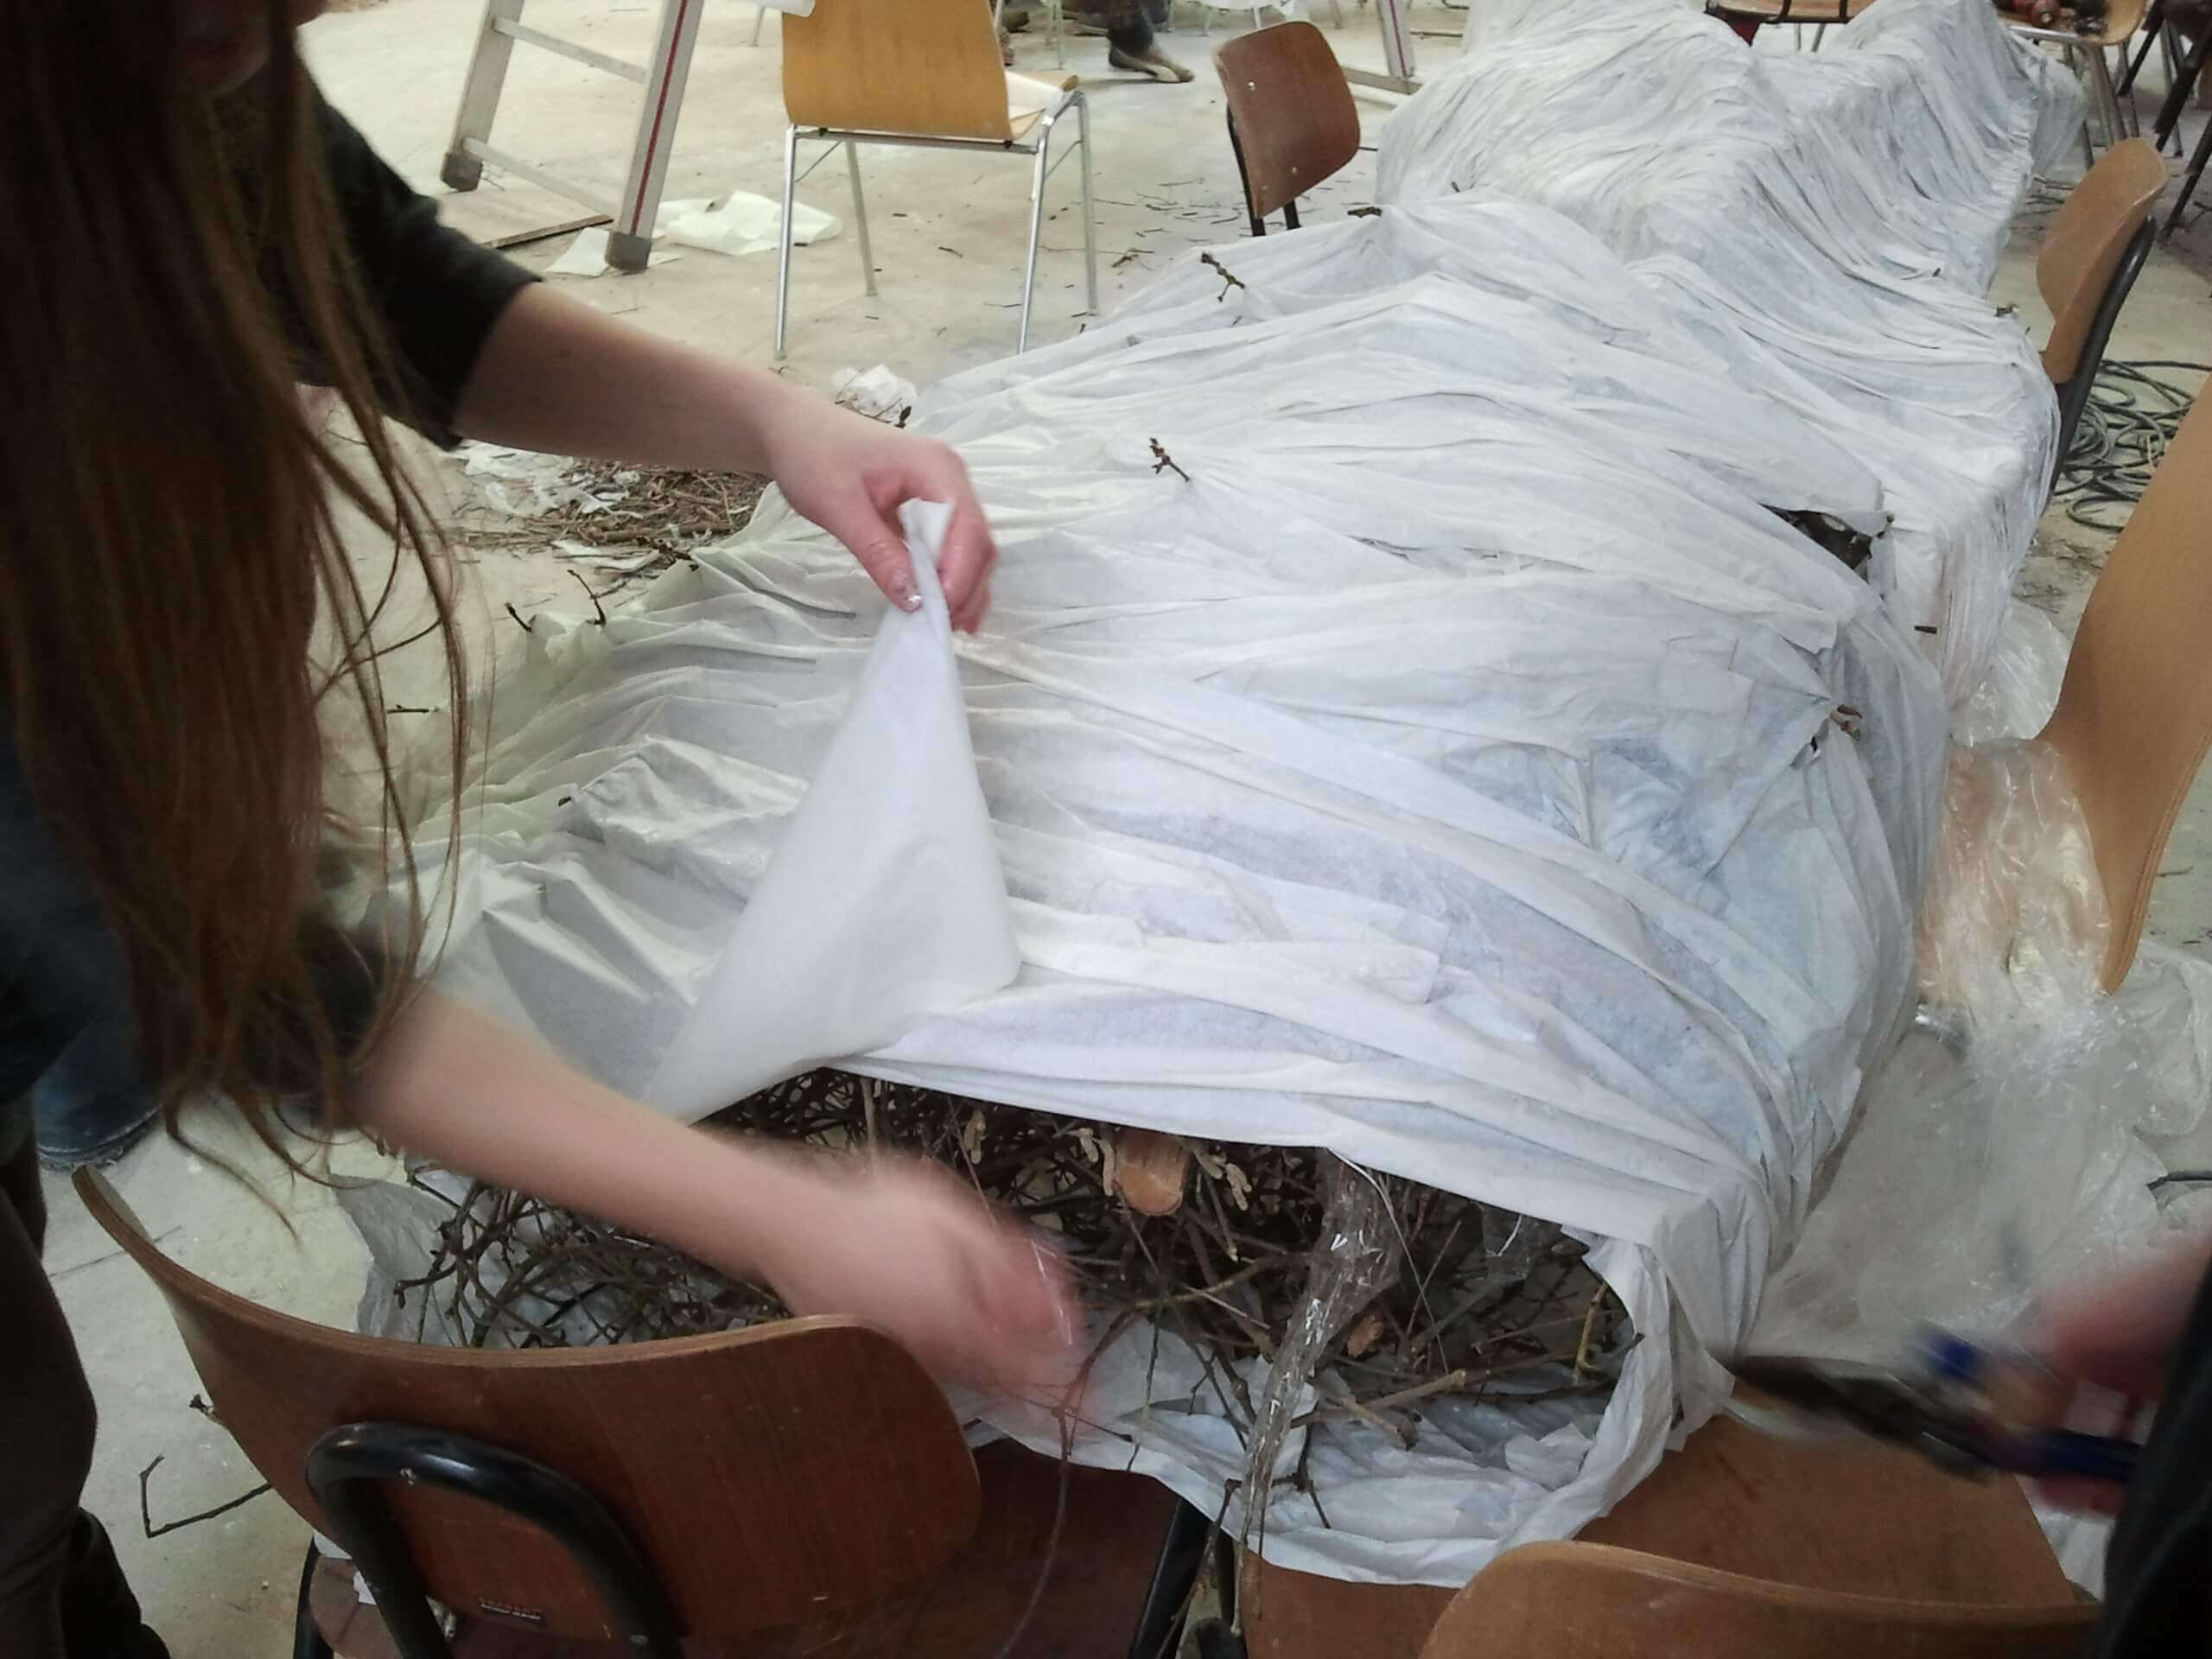 Mumifizierung: Mara Lena Schönborn